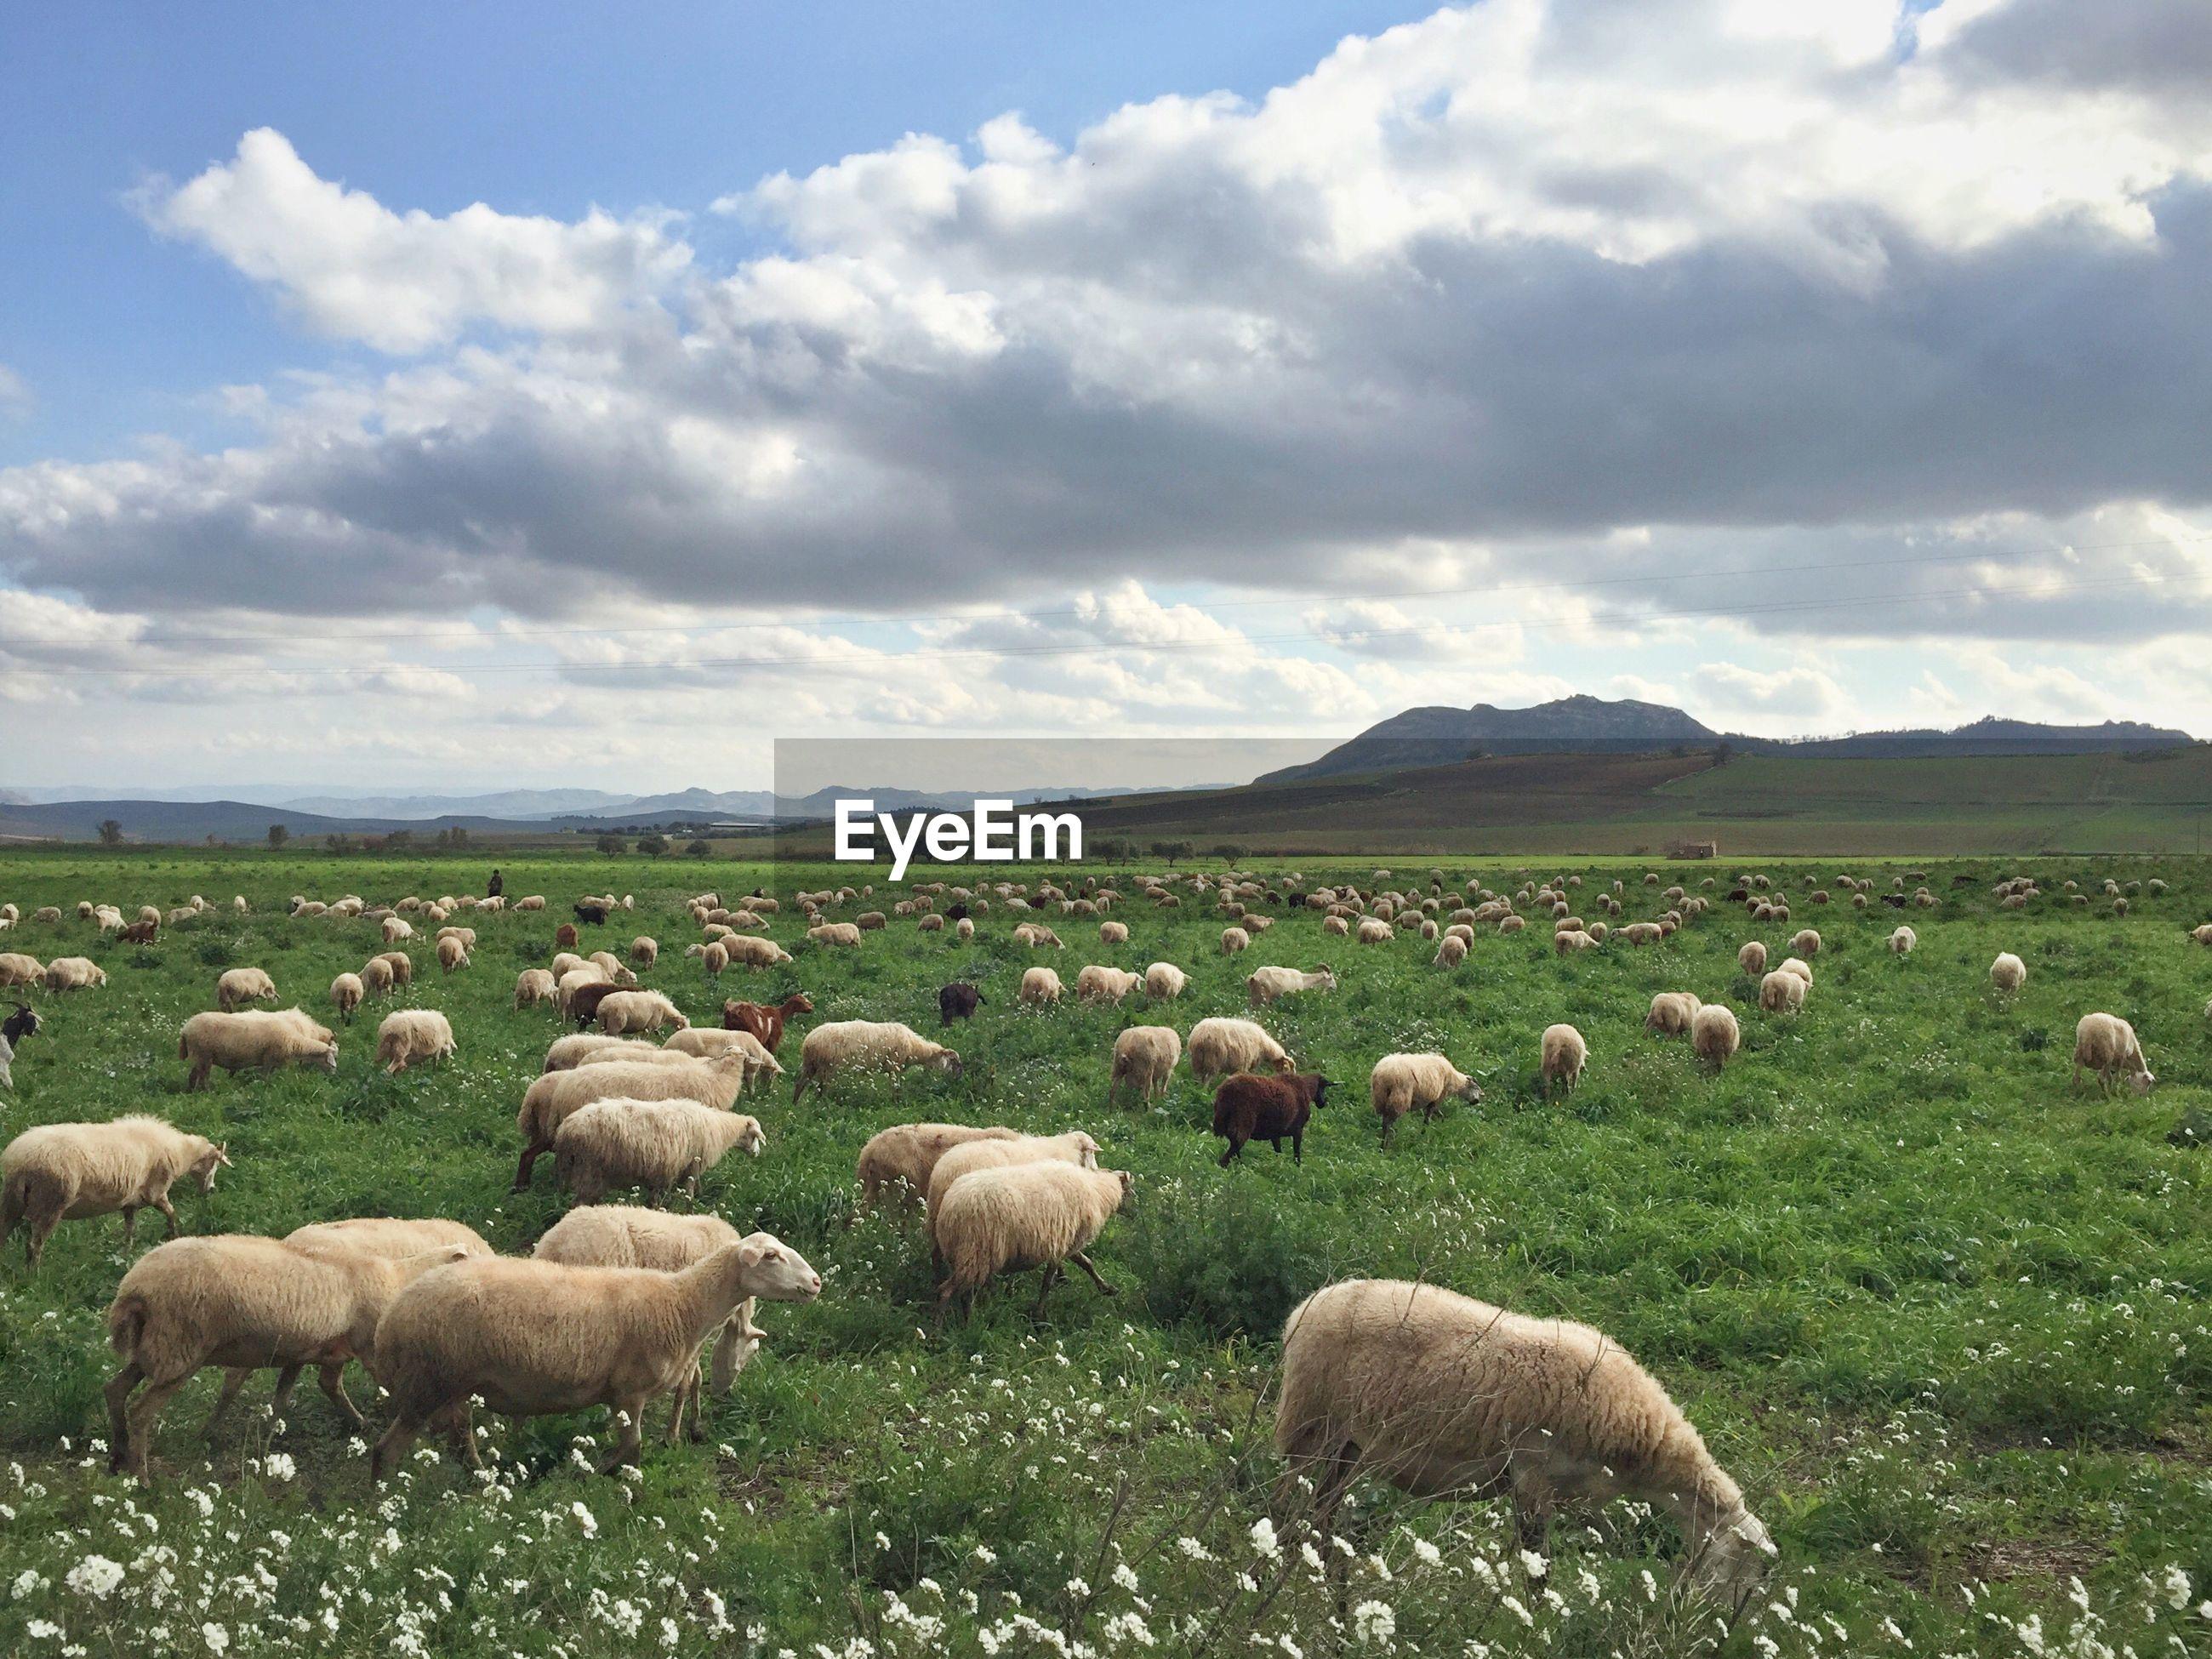 Flock of sheep on grassy landscape against sky